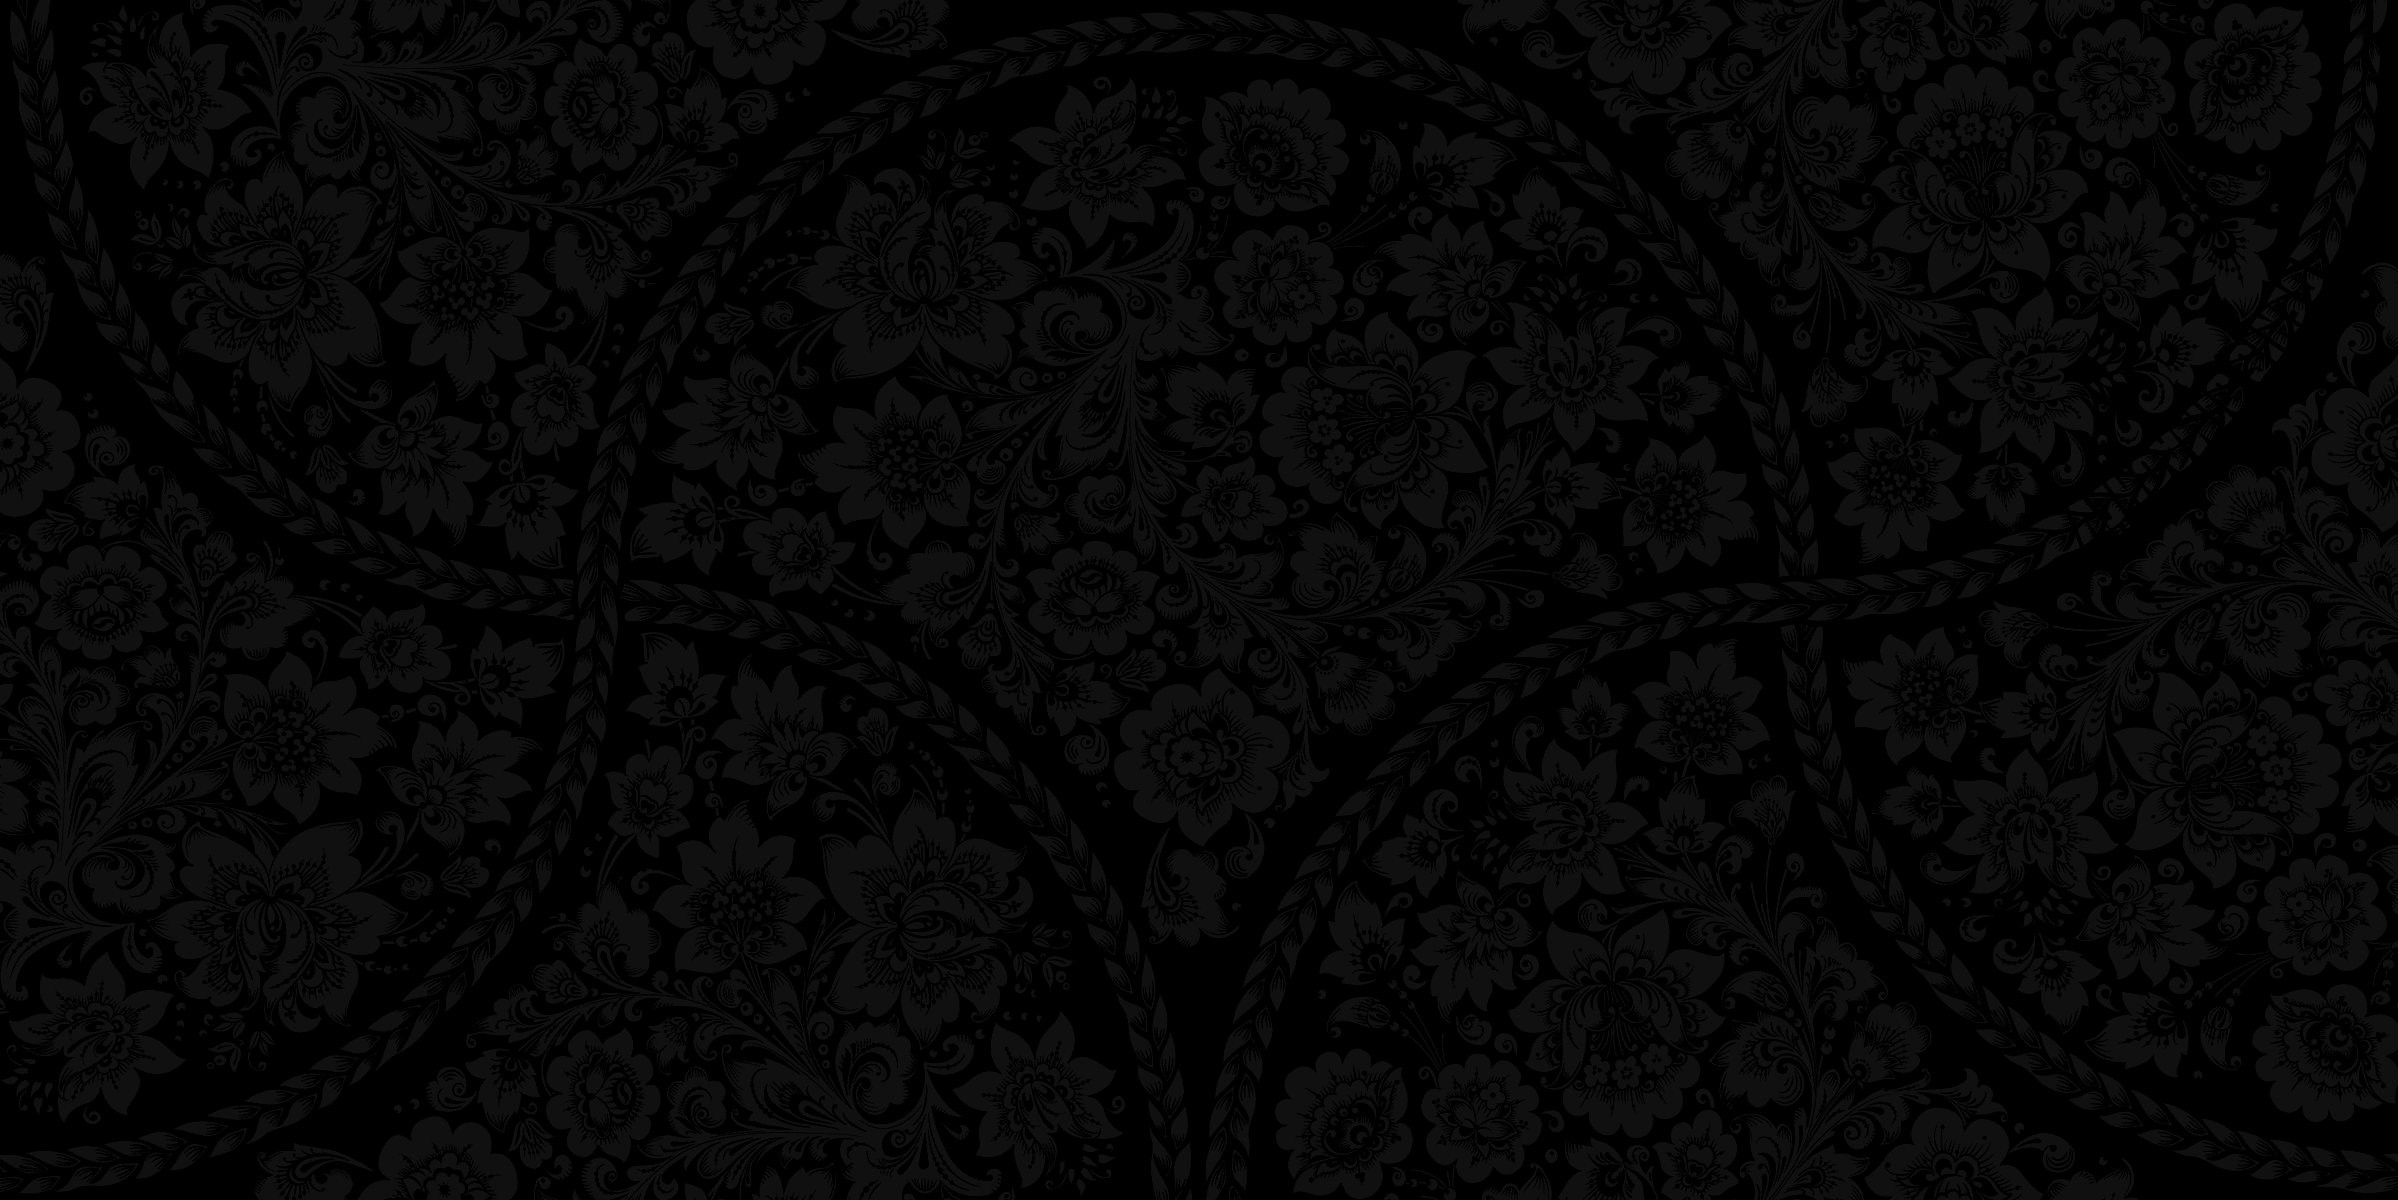 black background 1920x1200 - photo #35